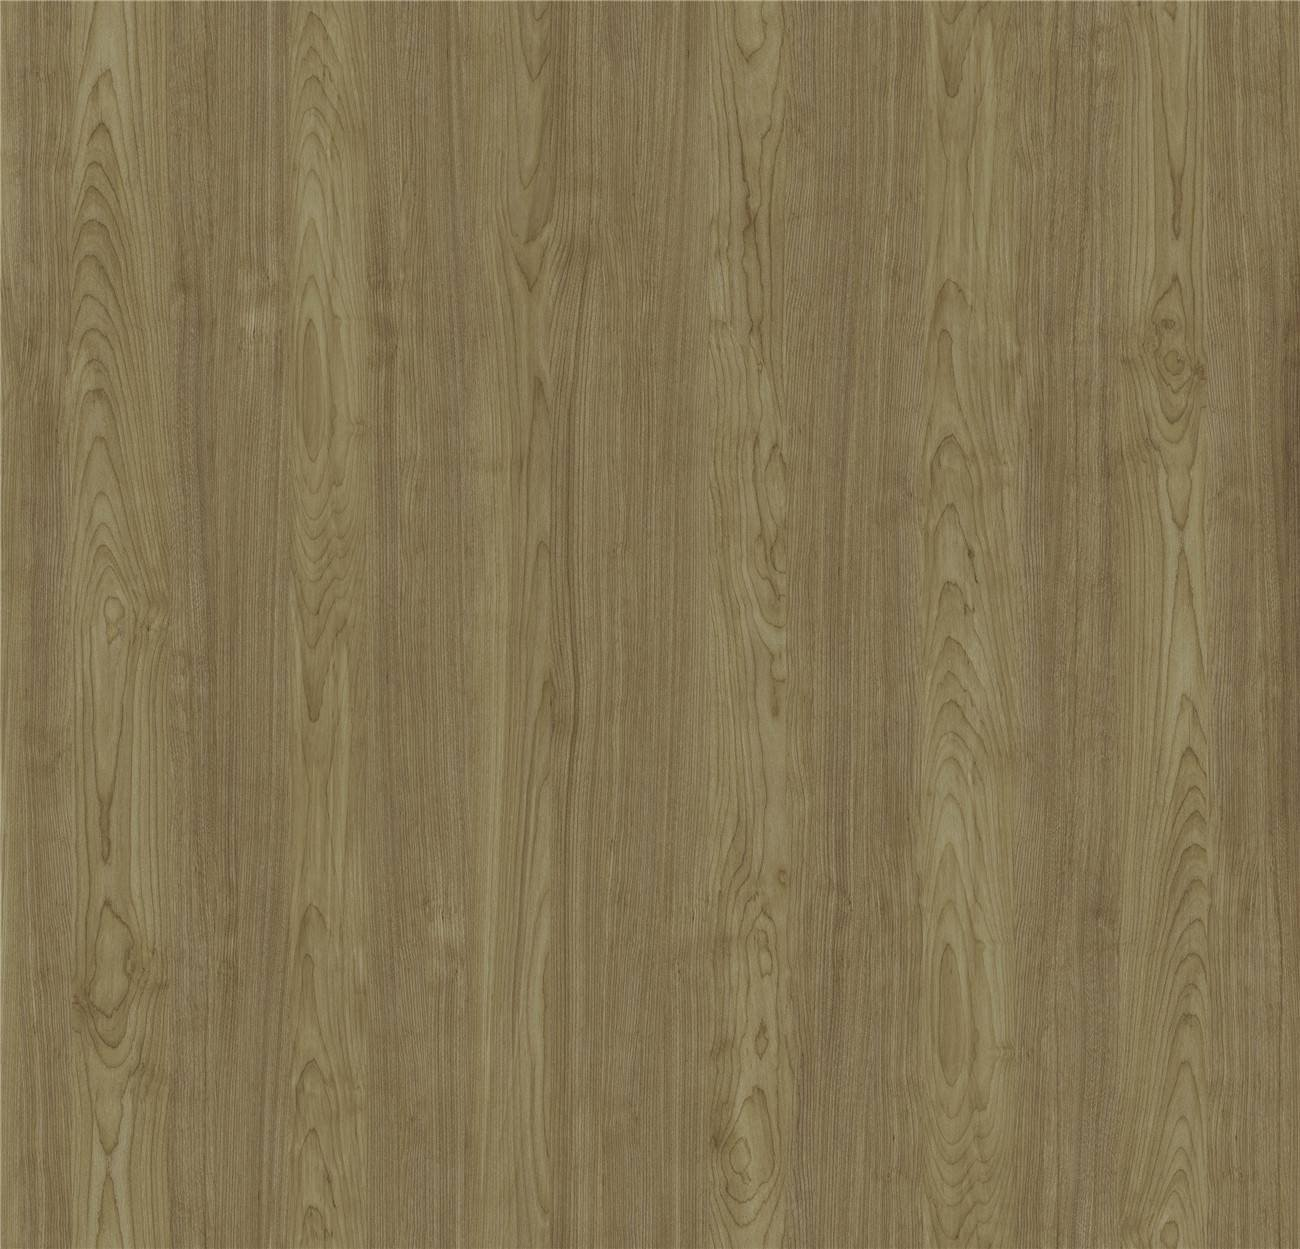 I.DECOR ID6008-01 Sterling Mountain Birch ID Series 2017 image48